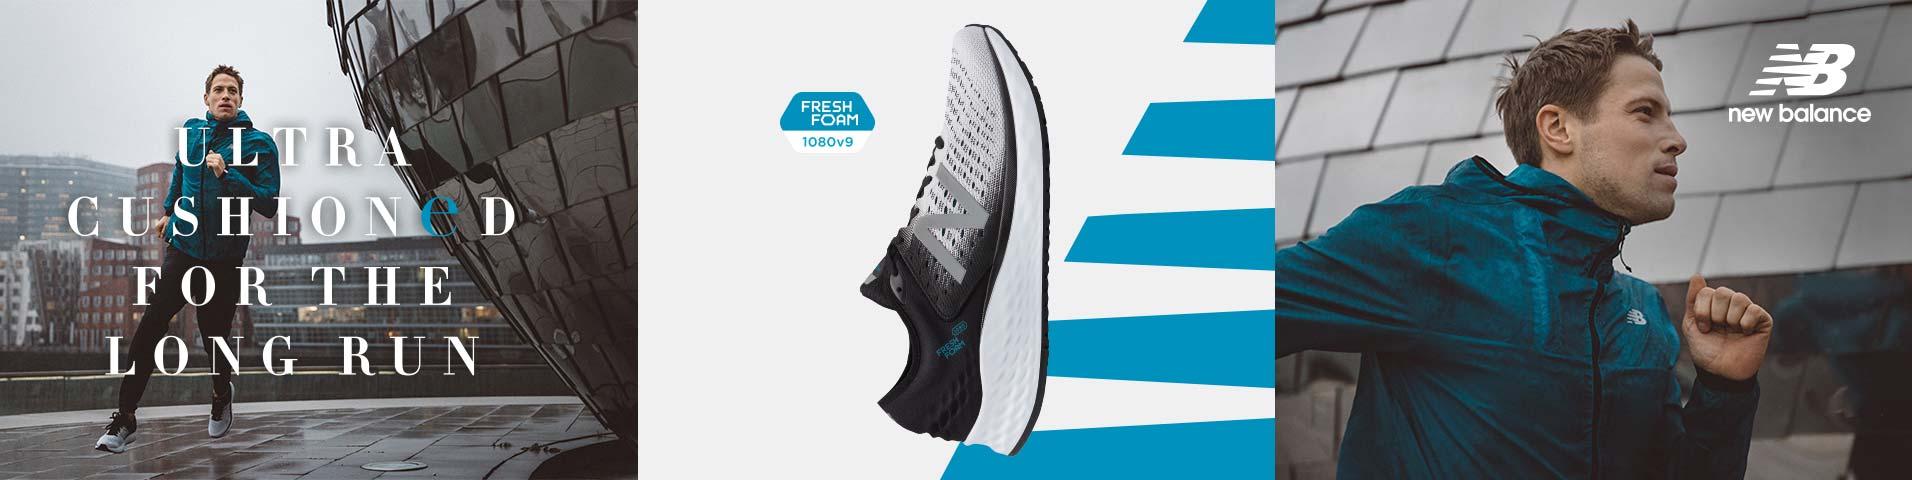 scarpe uomo new balance 547